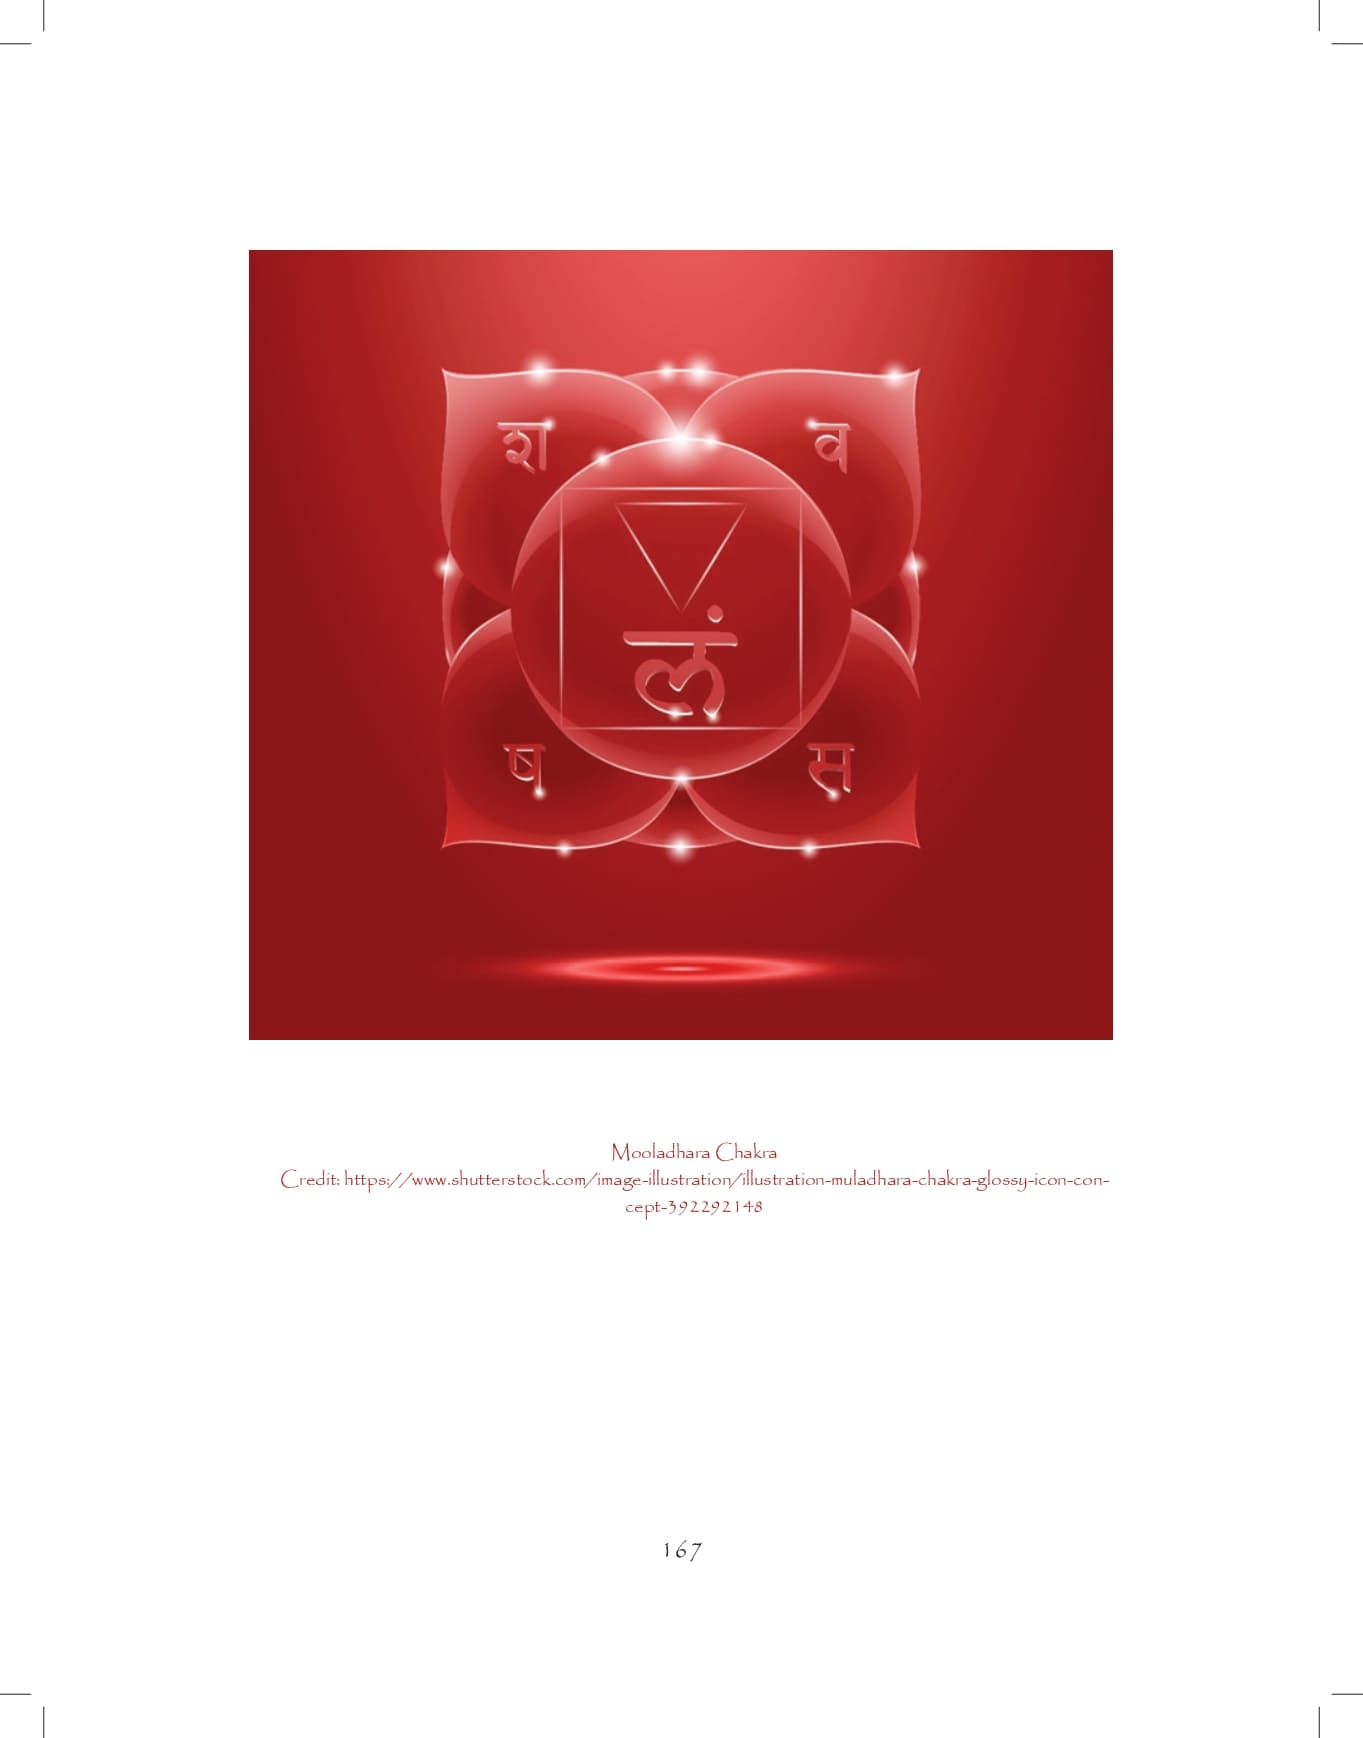 Ganesh-print_pages-to-jpg-0167.jpg